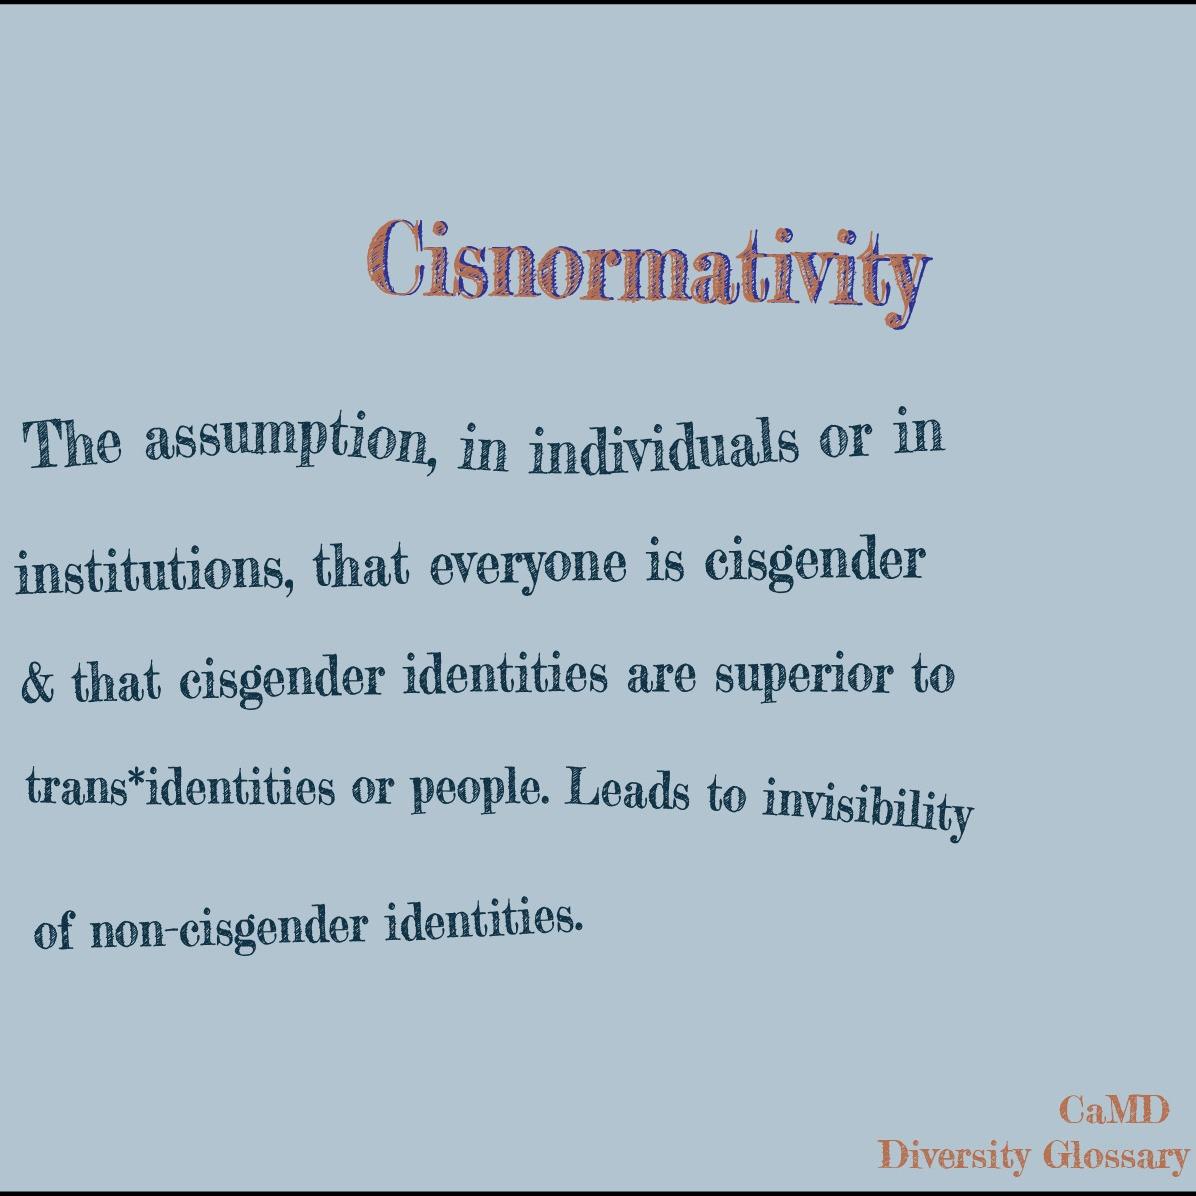 cisnormativity